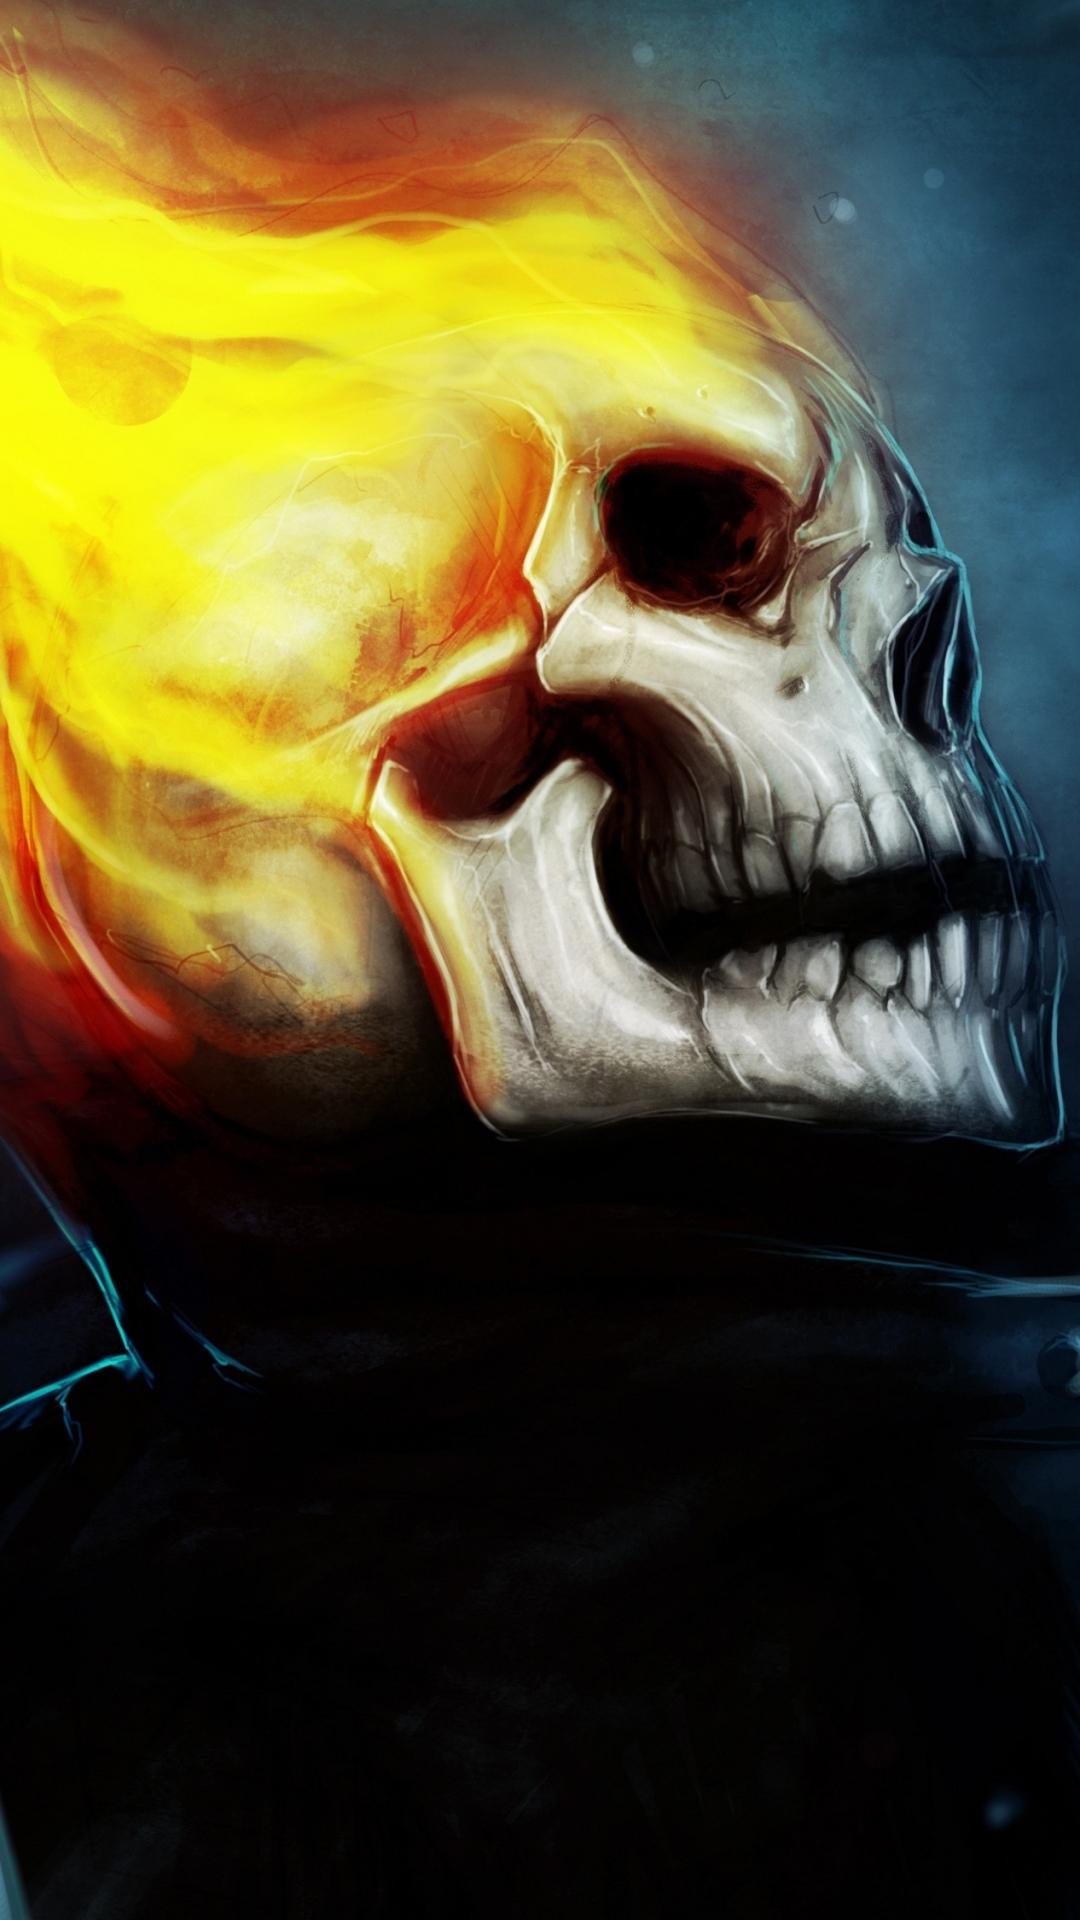 Comics Ghost Rider 1080x1920 Mobile Wallpaper